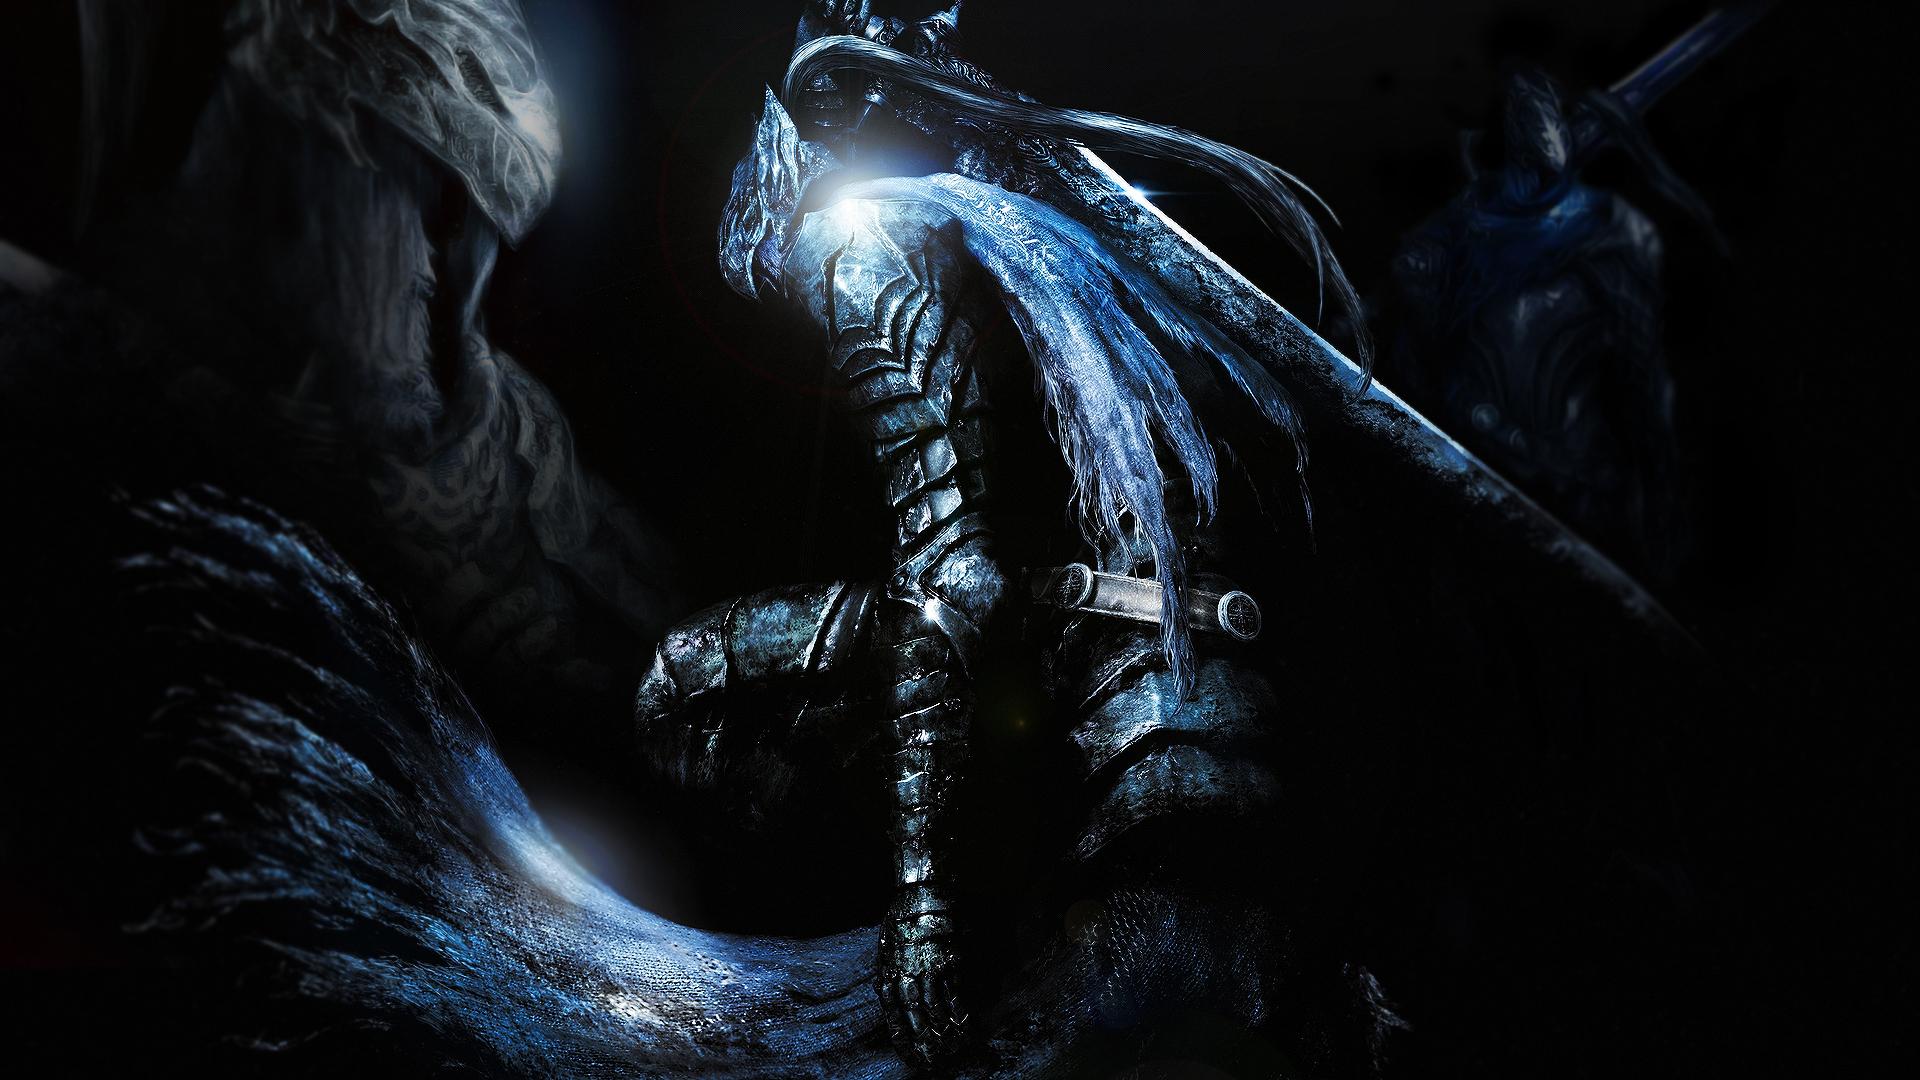 Dark Souls 2 Beta Prepare To Preview: Dark Souls Artorias Wallpaper By Kobaltmaster On DeviantArt